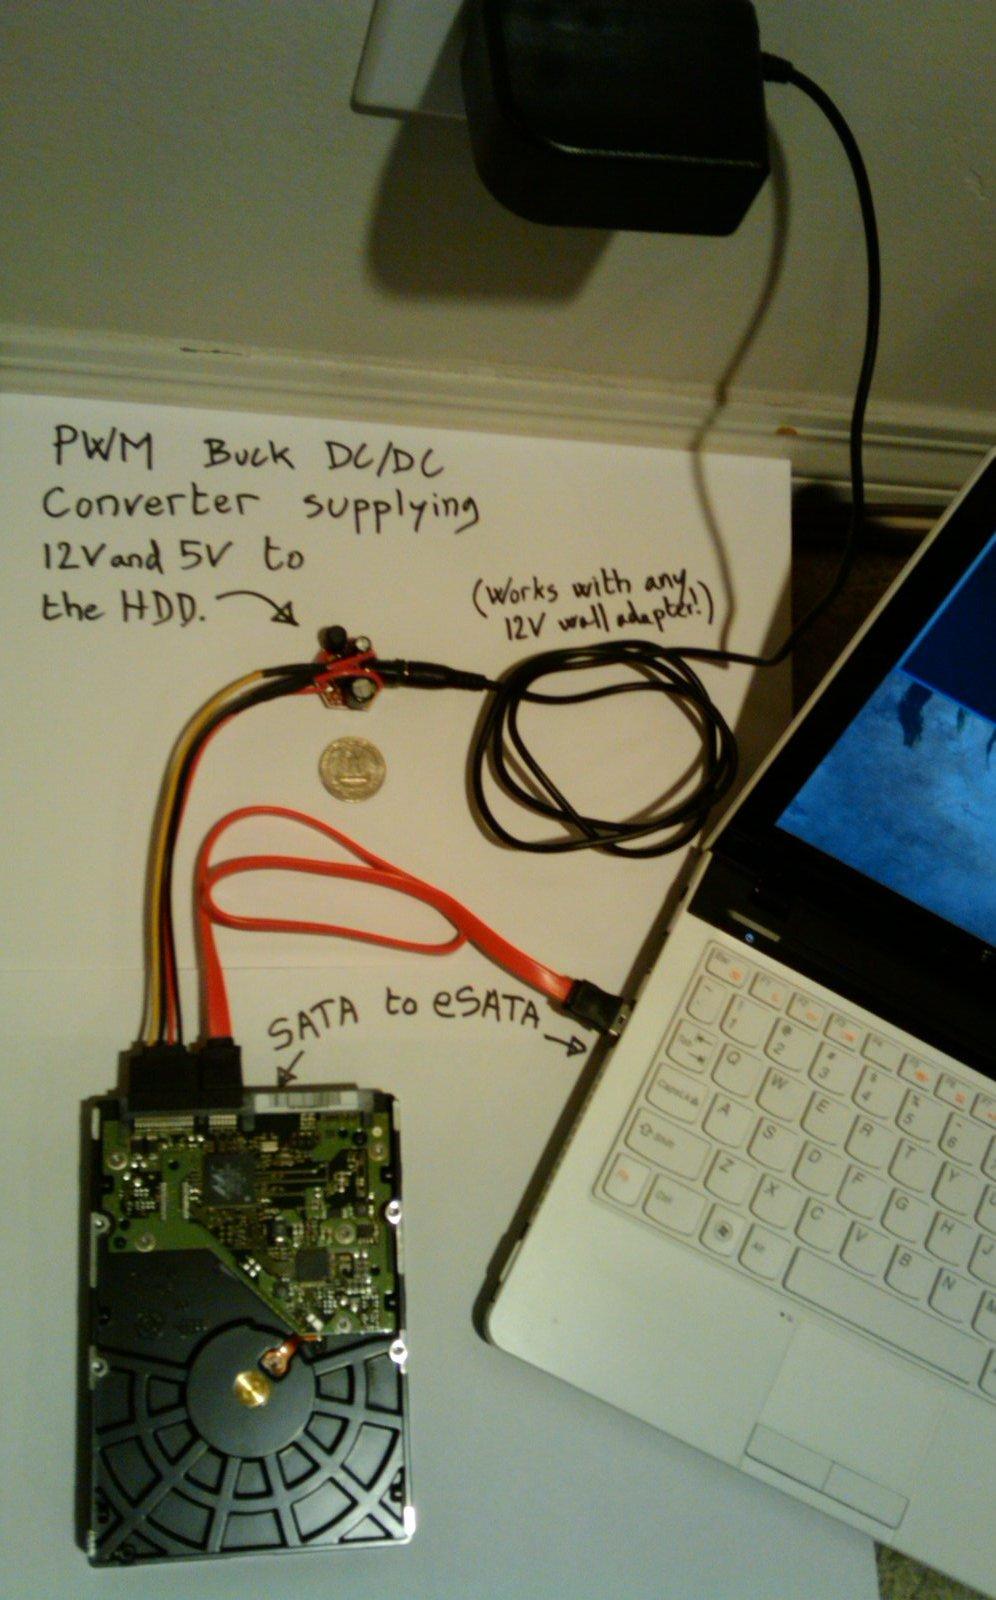 Sata Usb Adapter Wire Diagram   Manual E-Books - Sata To Usb Wiring Diagram